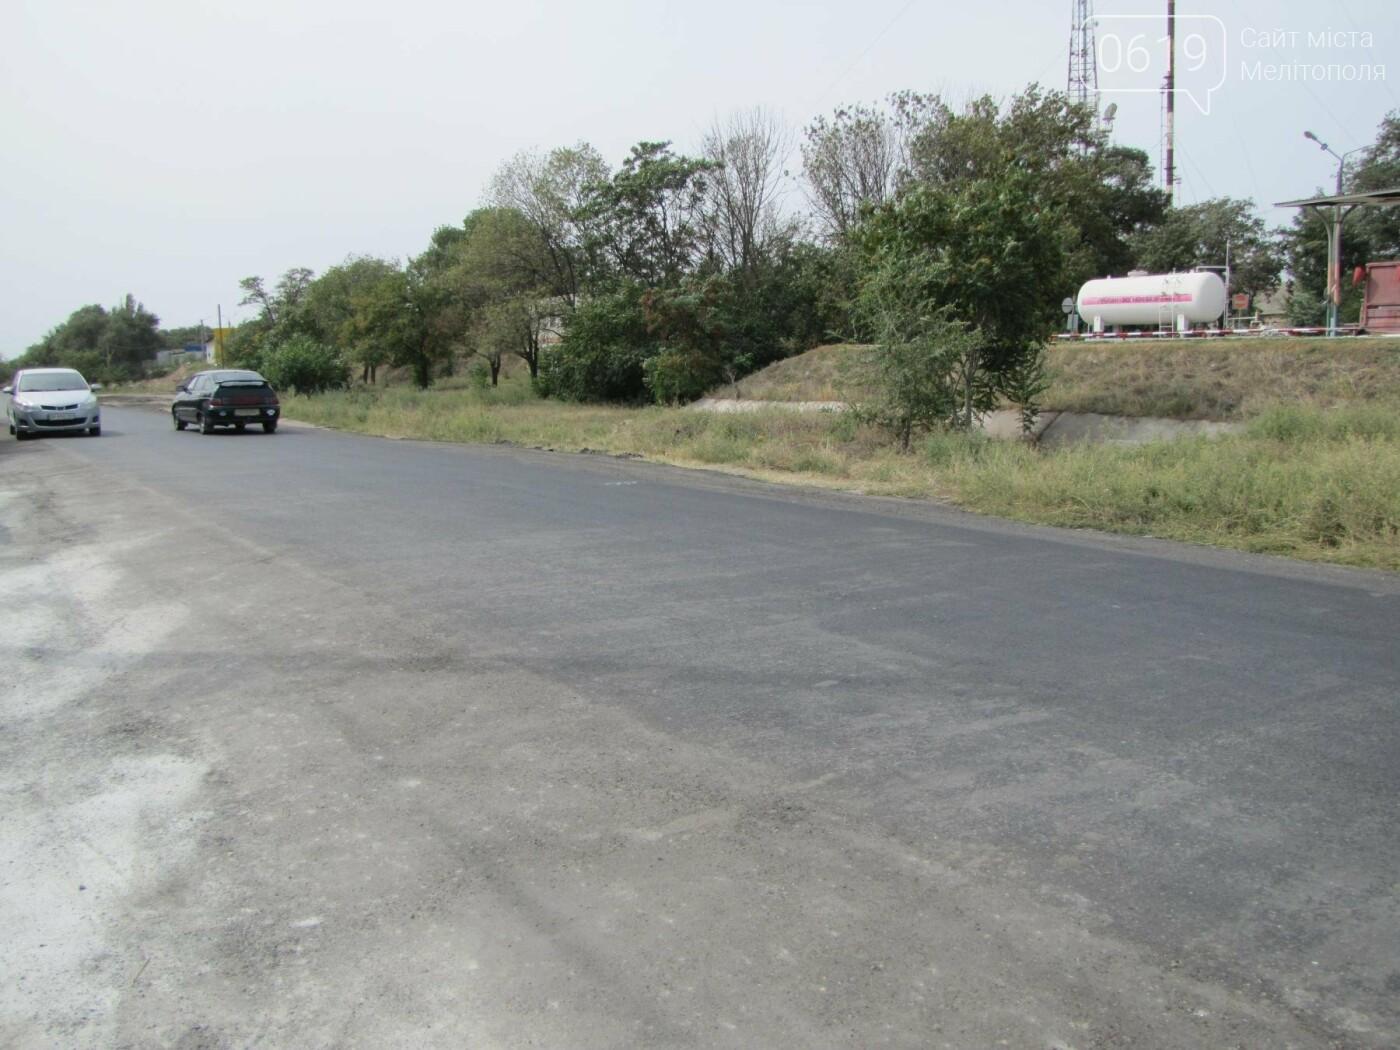 В Мелитополе отремонтировали дорогу на окраине, фото-3, Фото сайта 0619